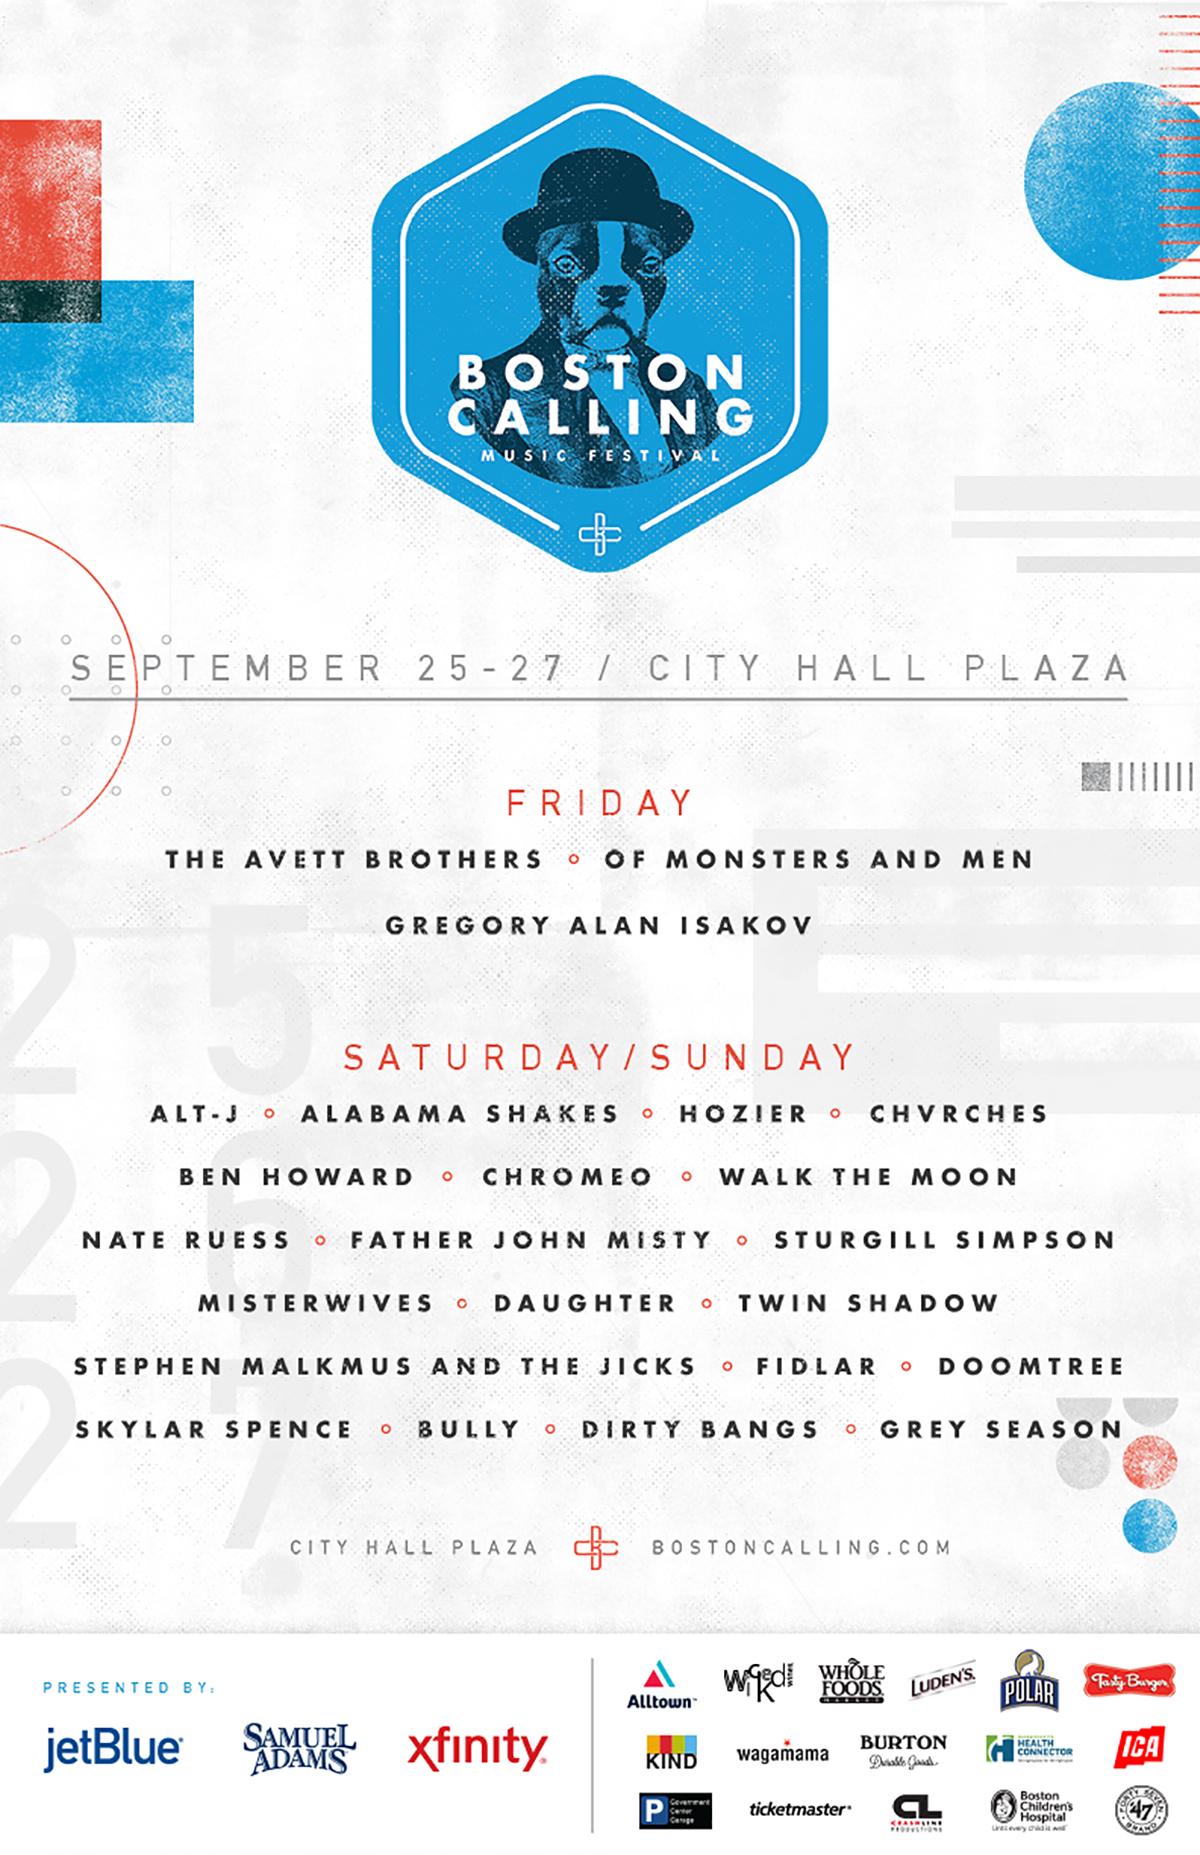 boston calling fall 2015 lineup